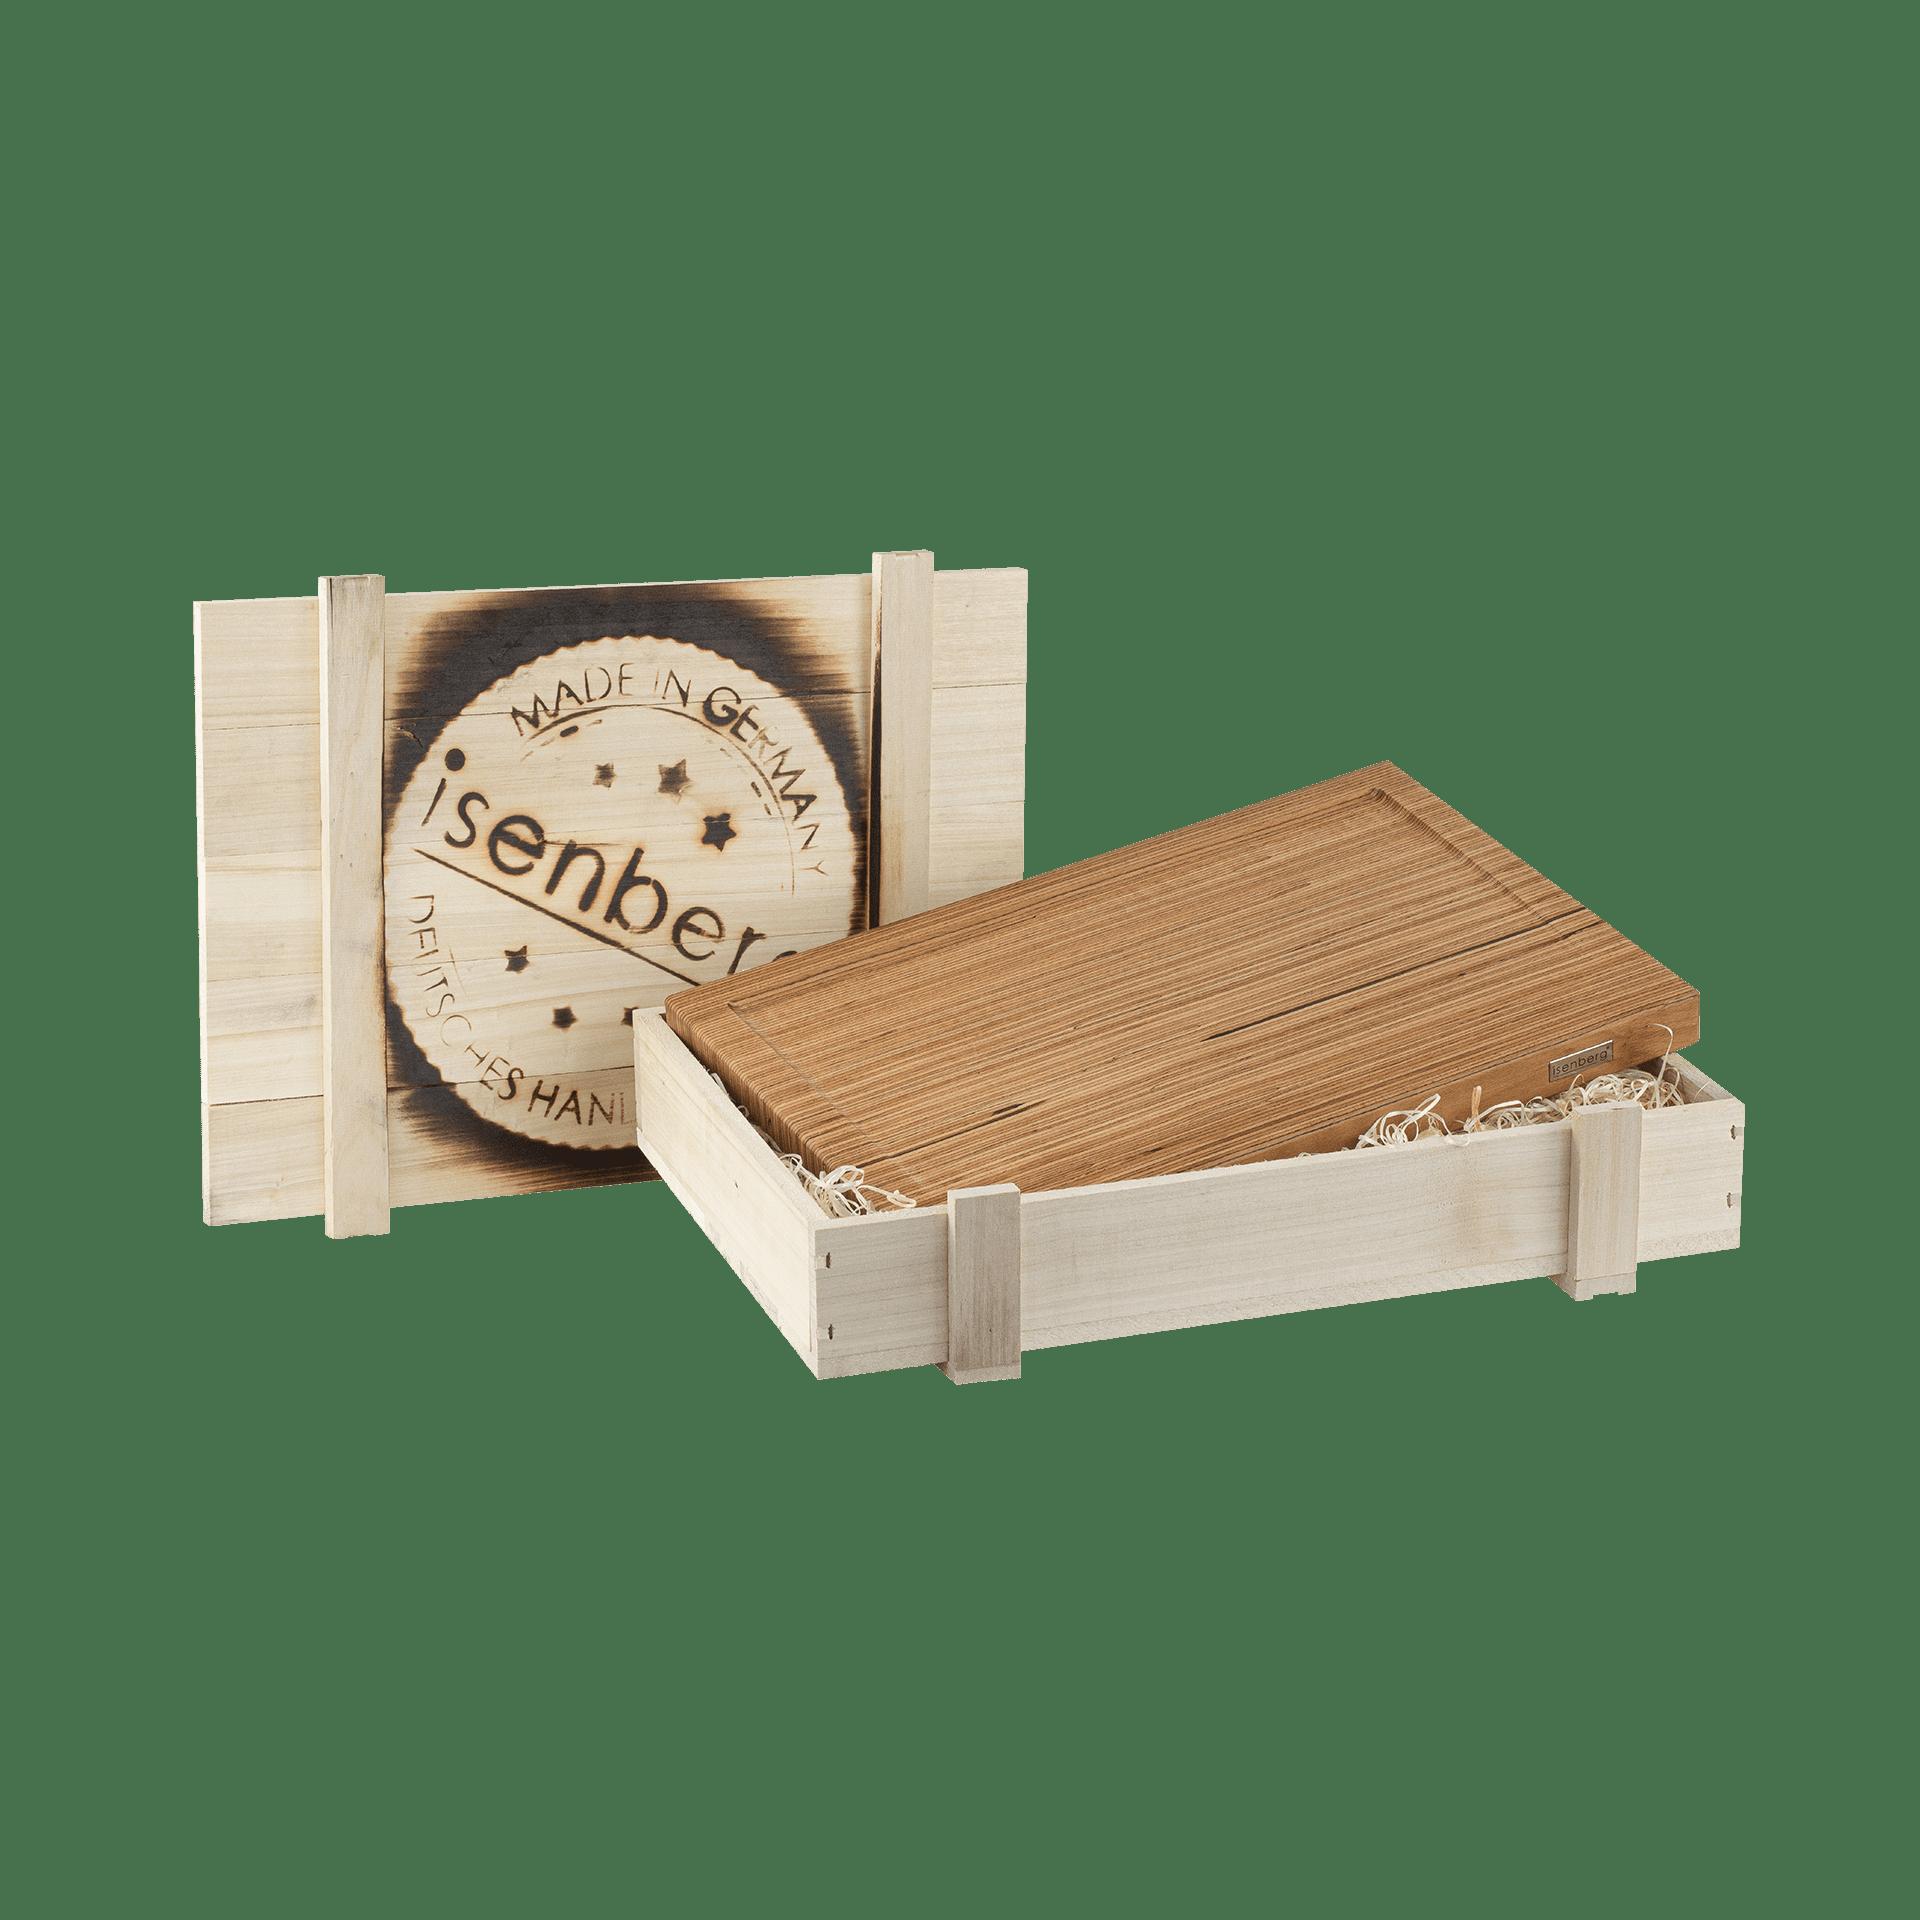 Isenberg Profi Schneidebrett Typ 3 Baubuche in Kiste